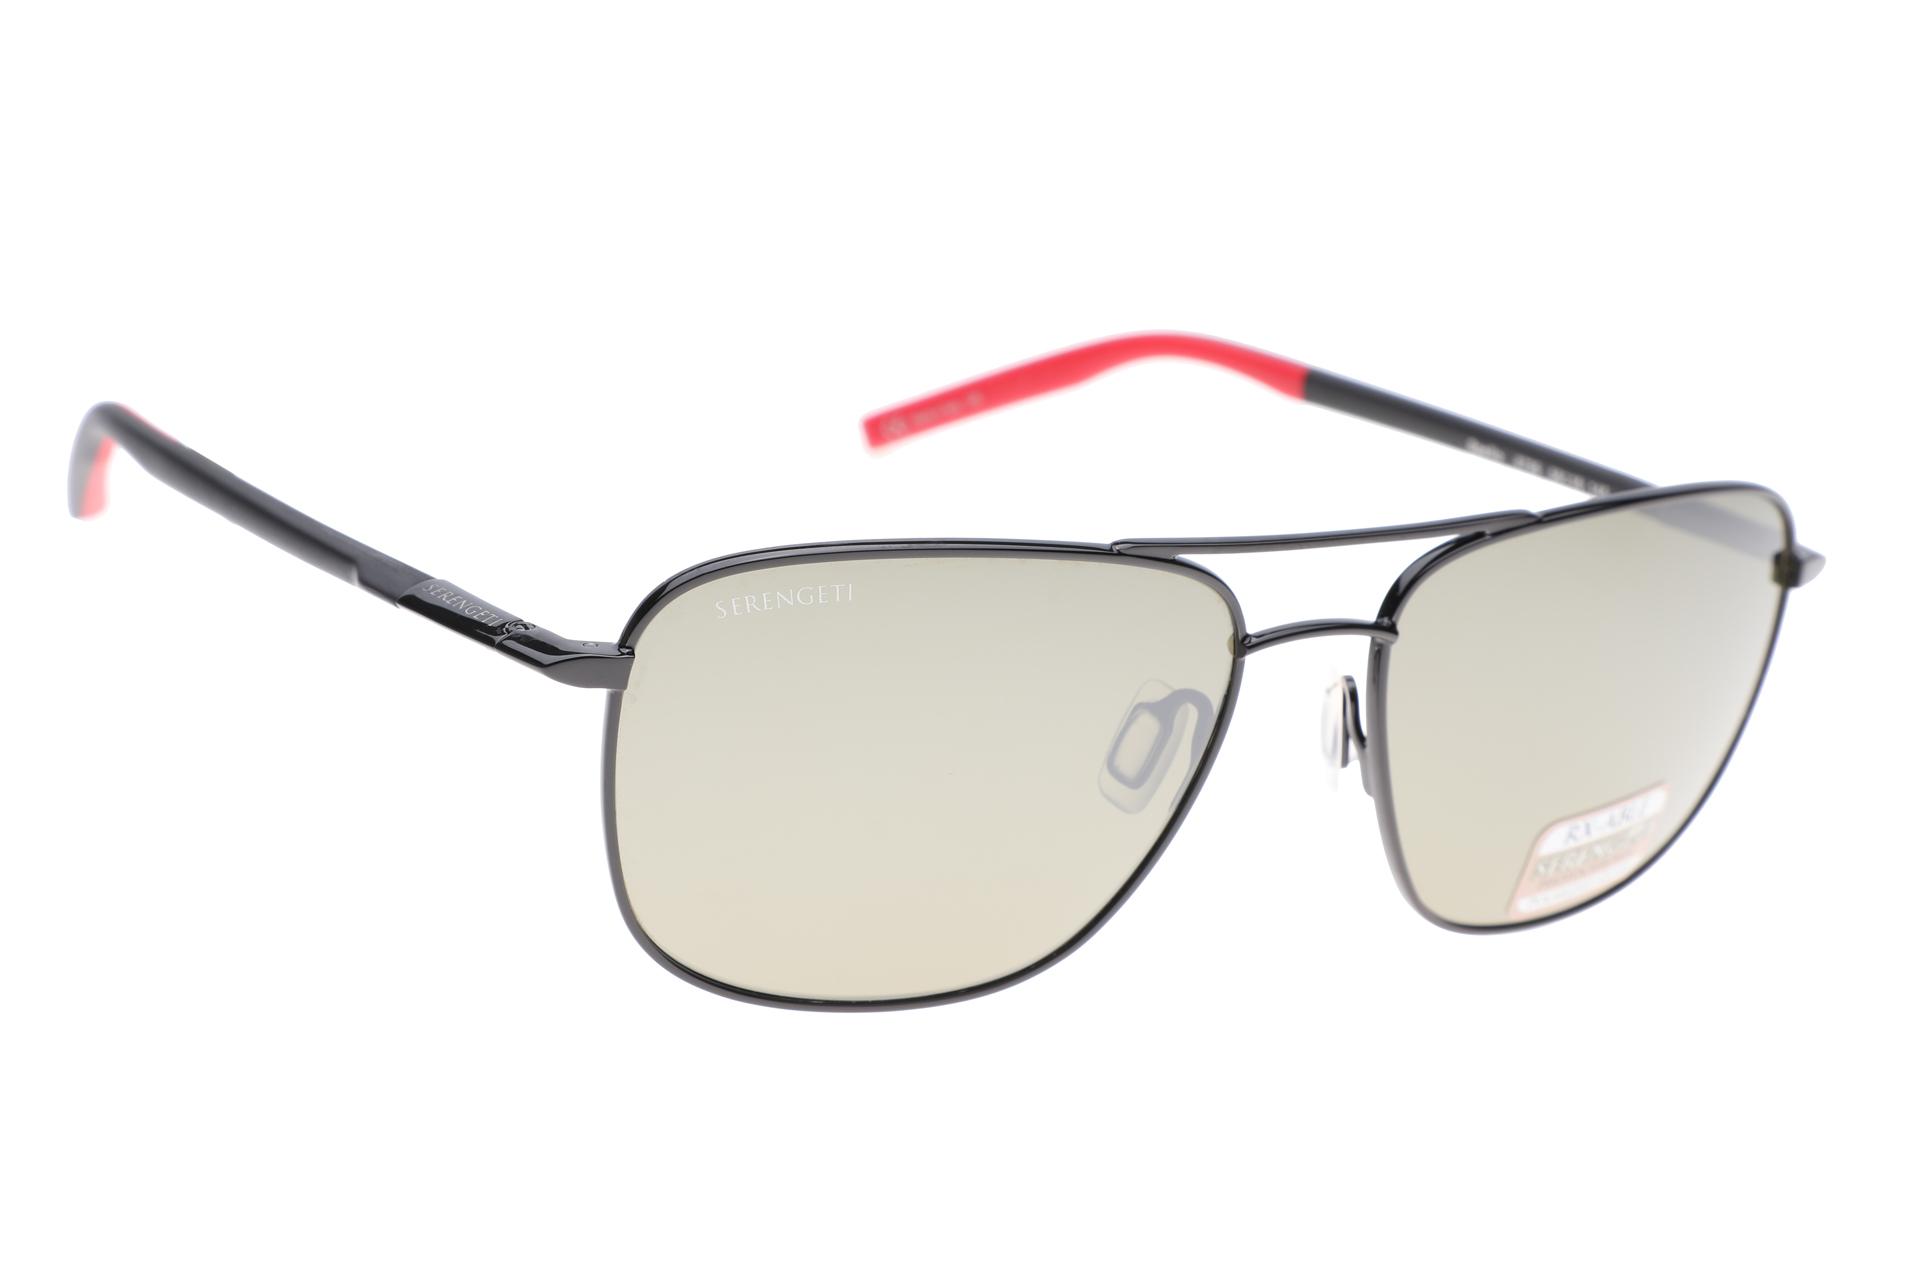 613ebdbba2cc75 Serengeti Spello 8796 (Shiny Black Black Red) Gepolariseerd zonnebril